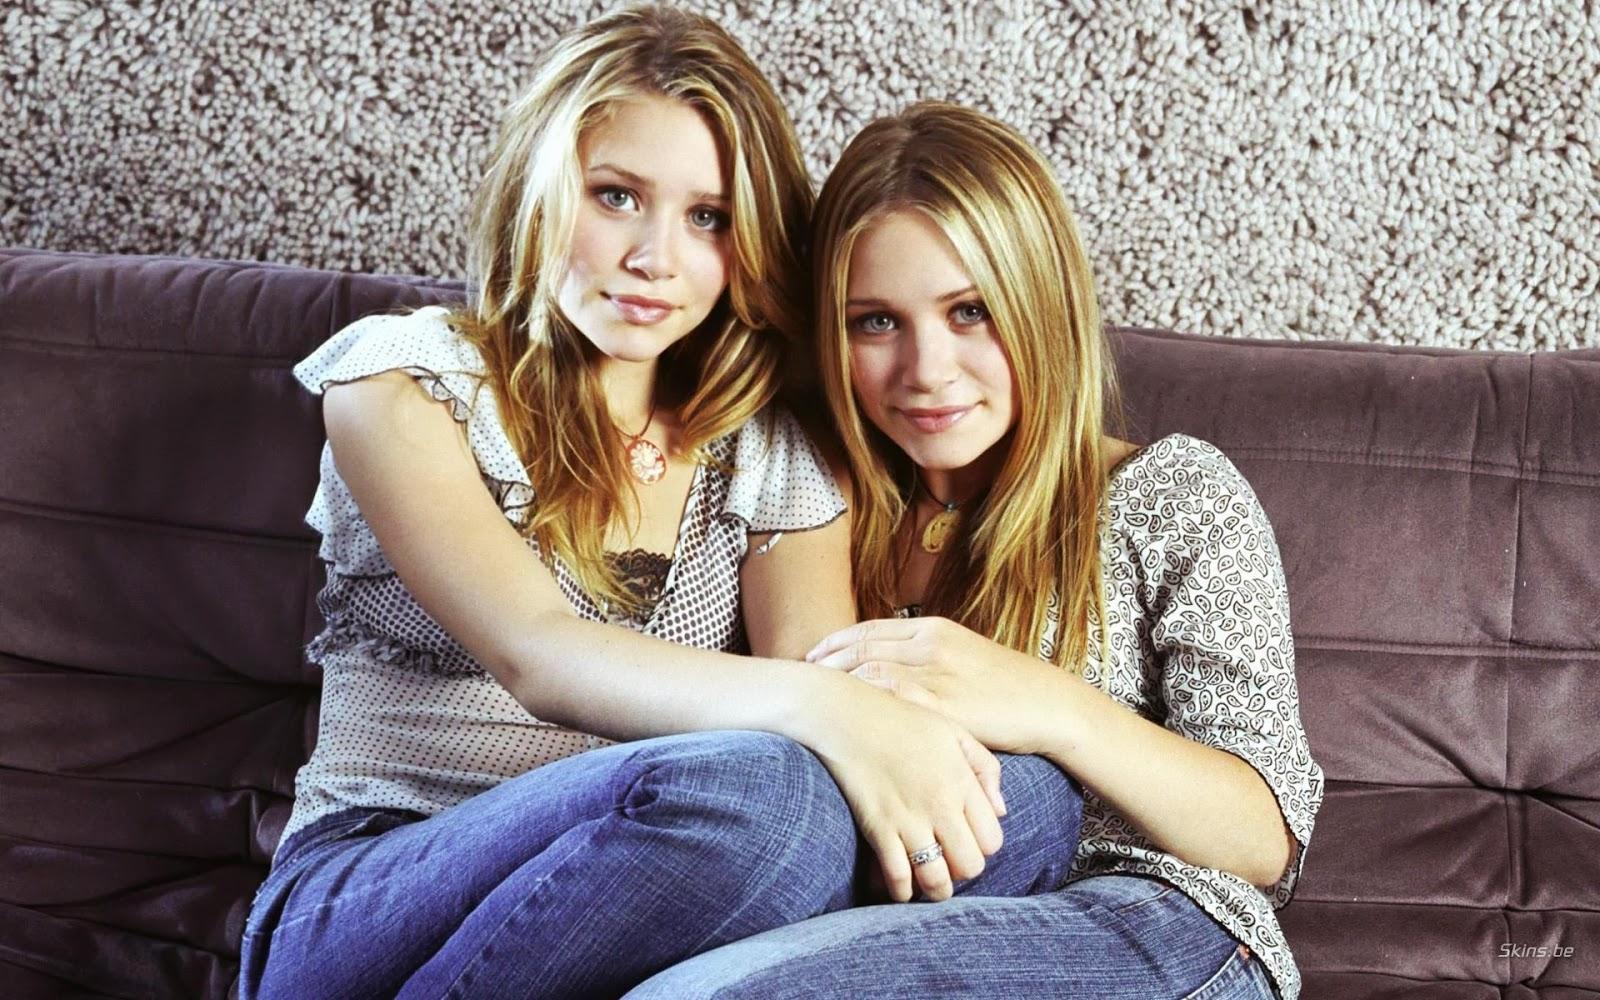 olsen twins - Celeb Images 12